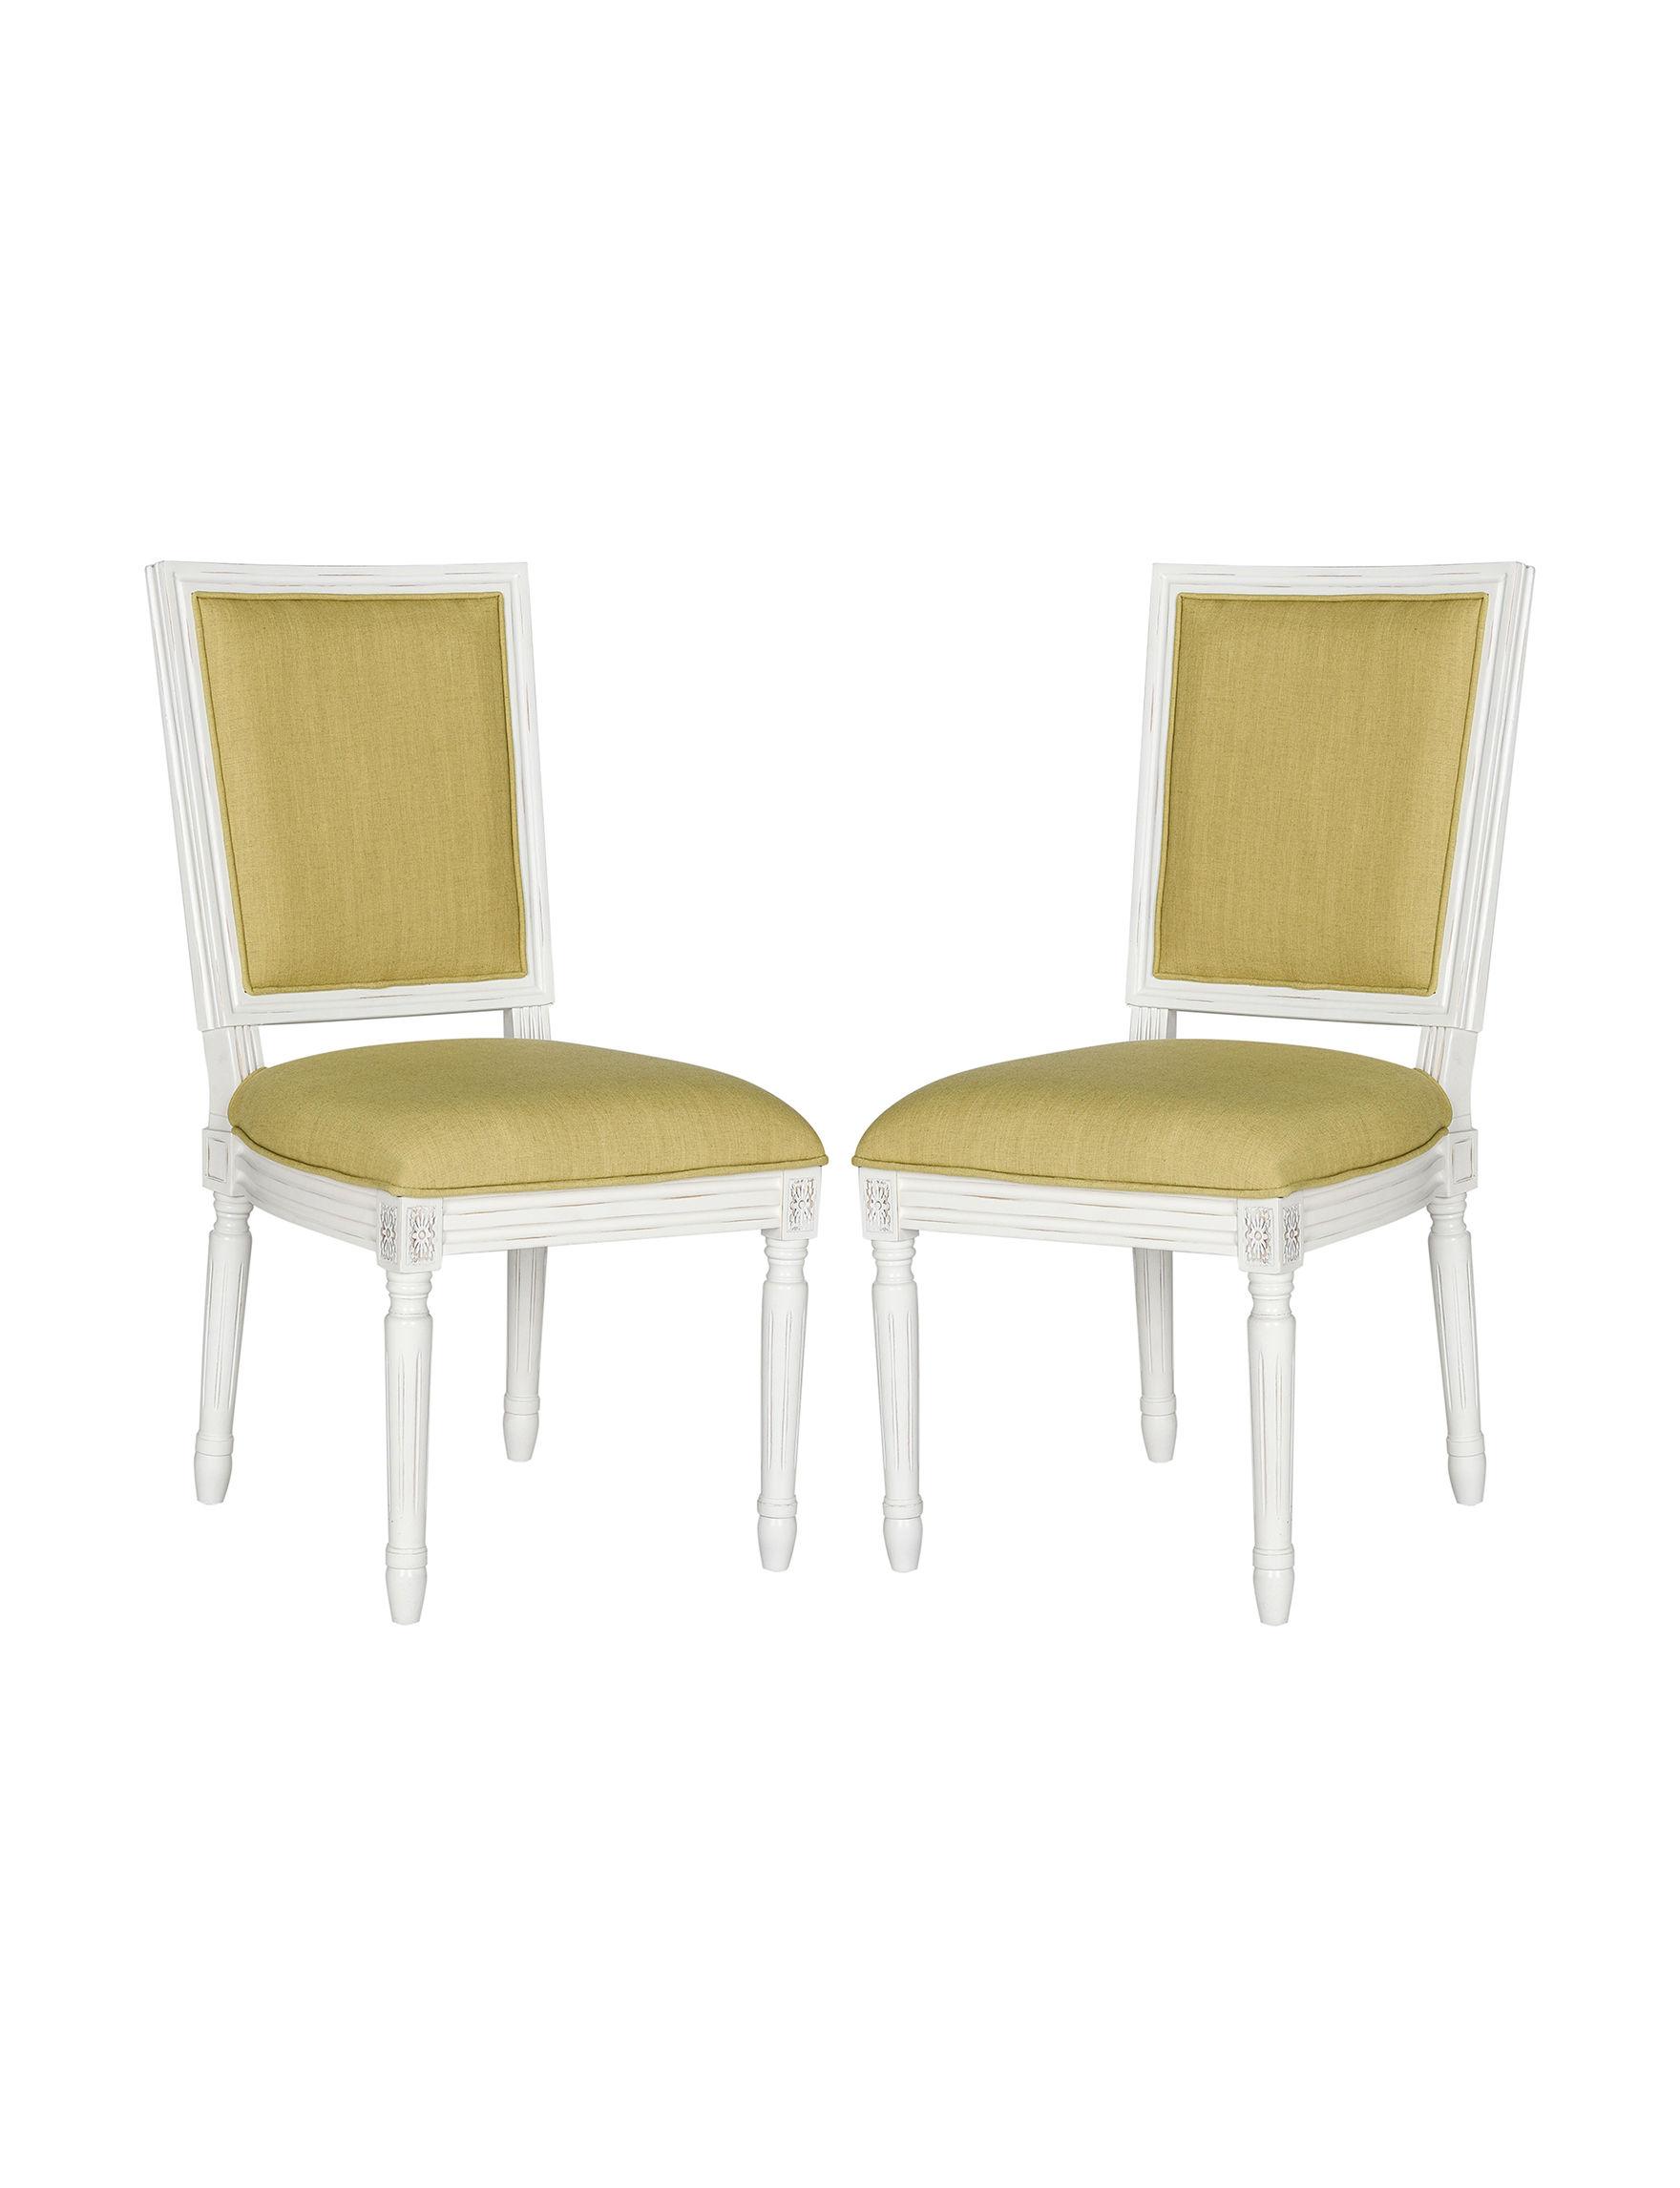 Safavieh Green Accent Chairs Kitchen & Dining Furniture